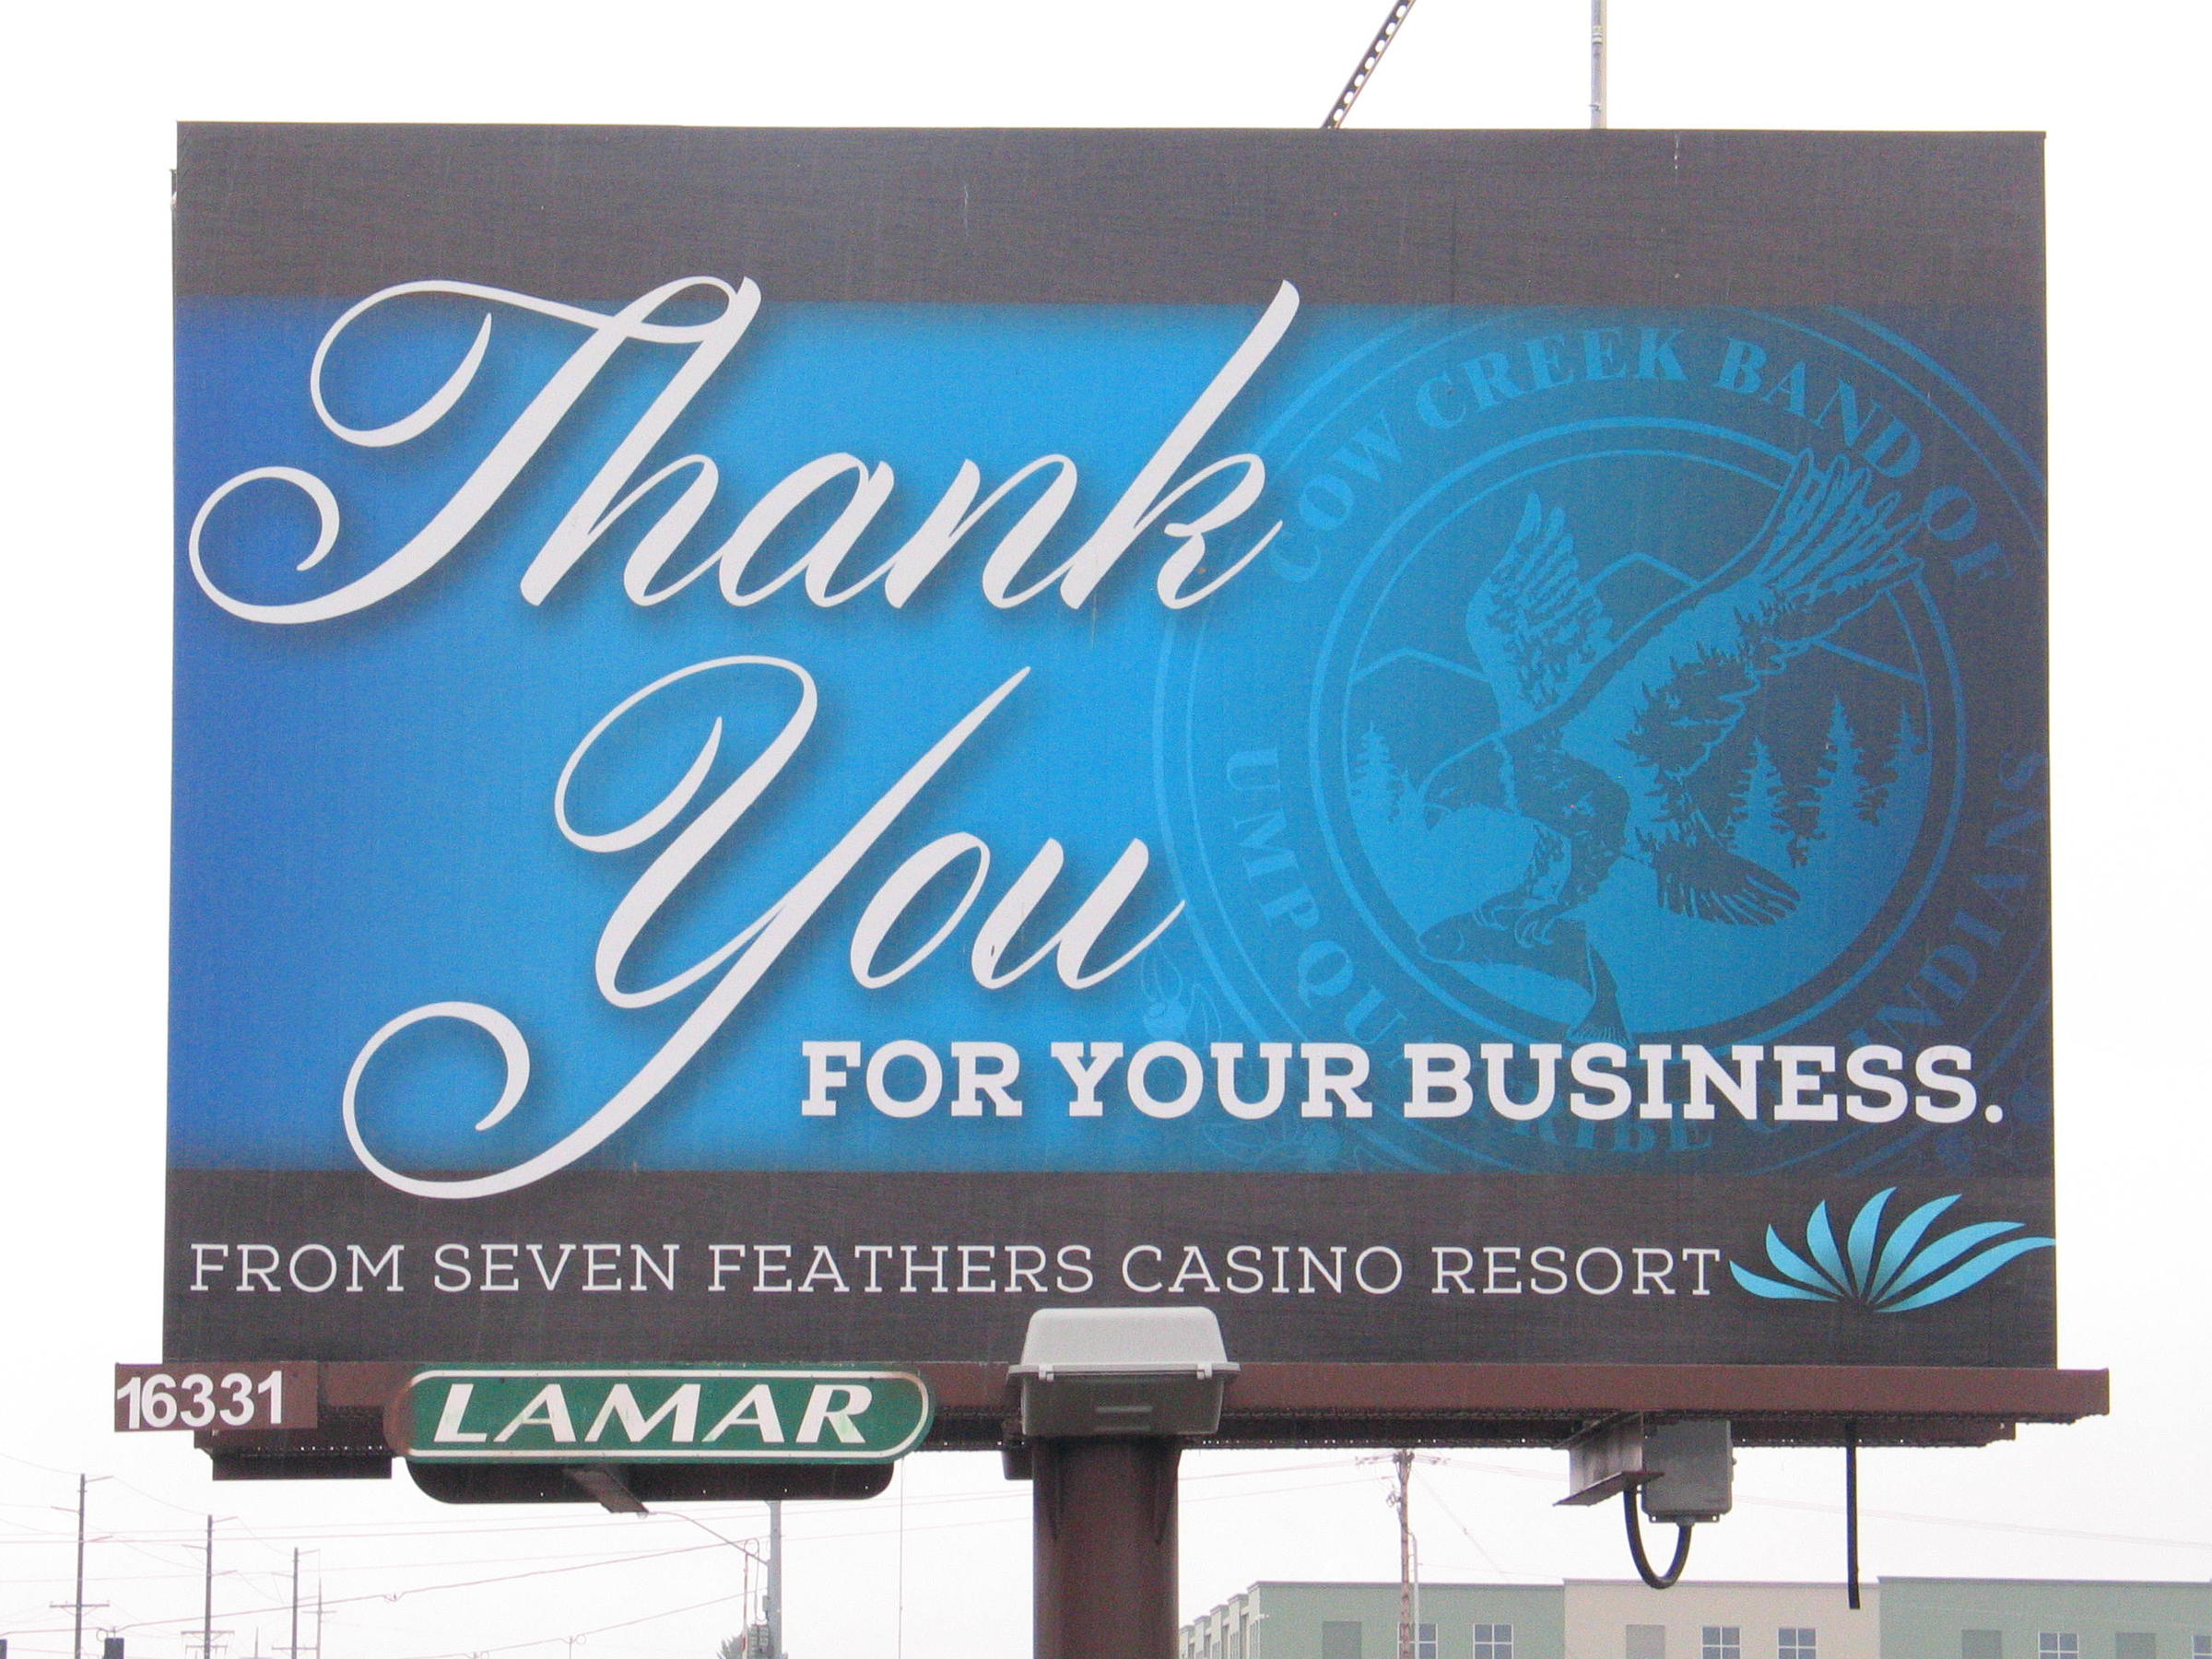 Seven feathers casino jobs